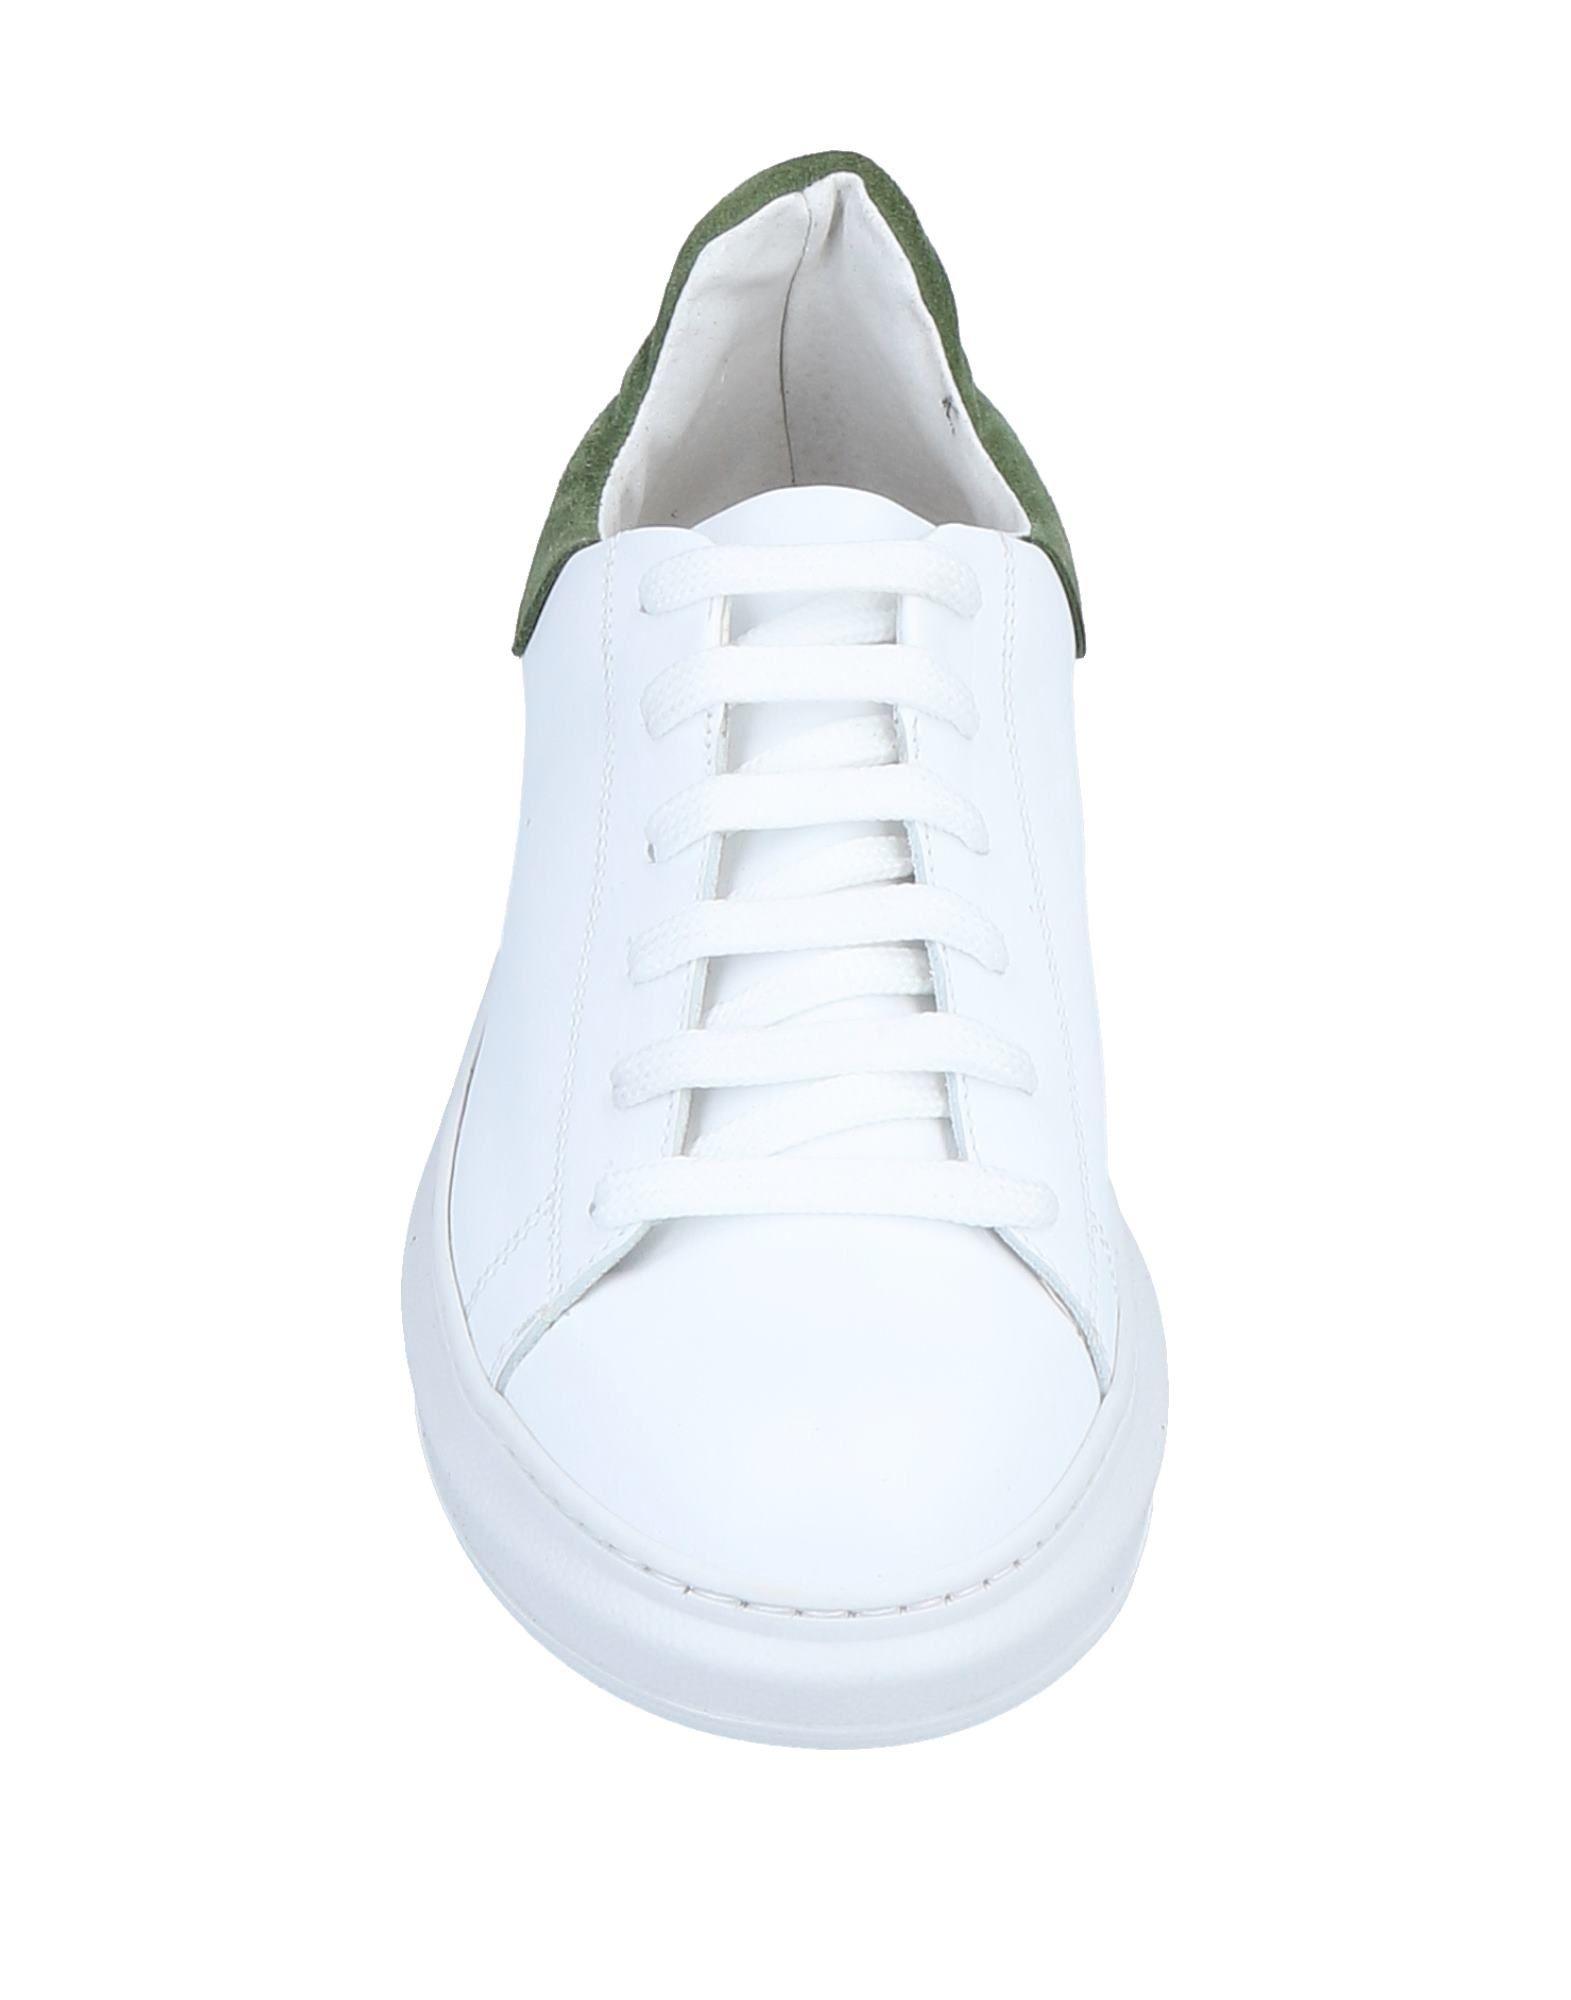 Gut um Sneakers billige Schuhe zu tragenTsd12 Sneakers um Damen  11567463HB 9dbf9b